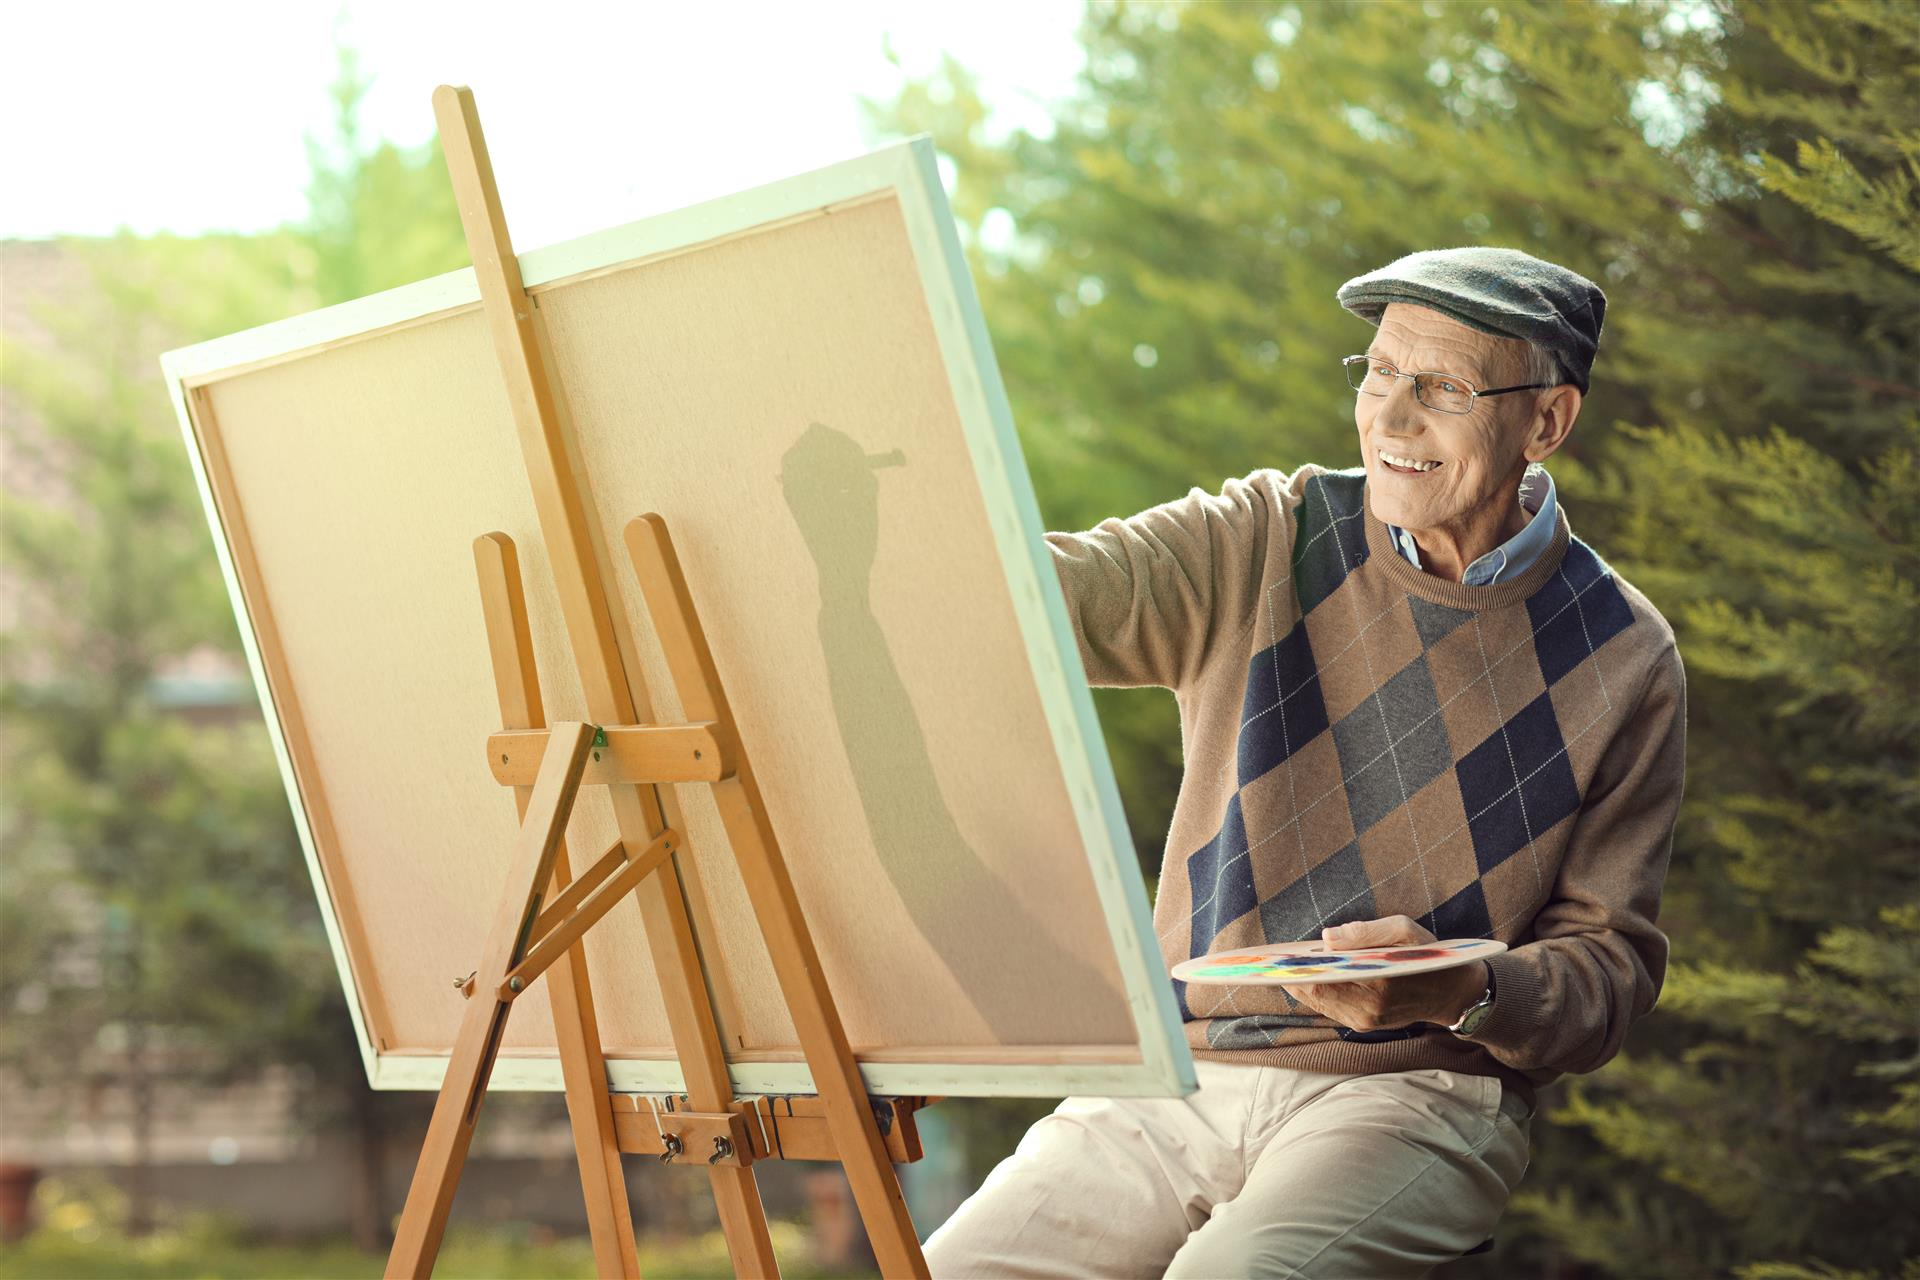 The Mental Health Benefits of Art